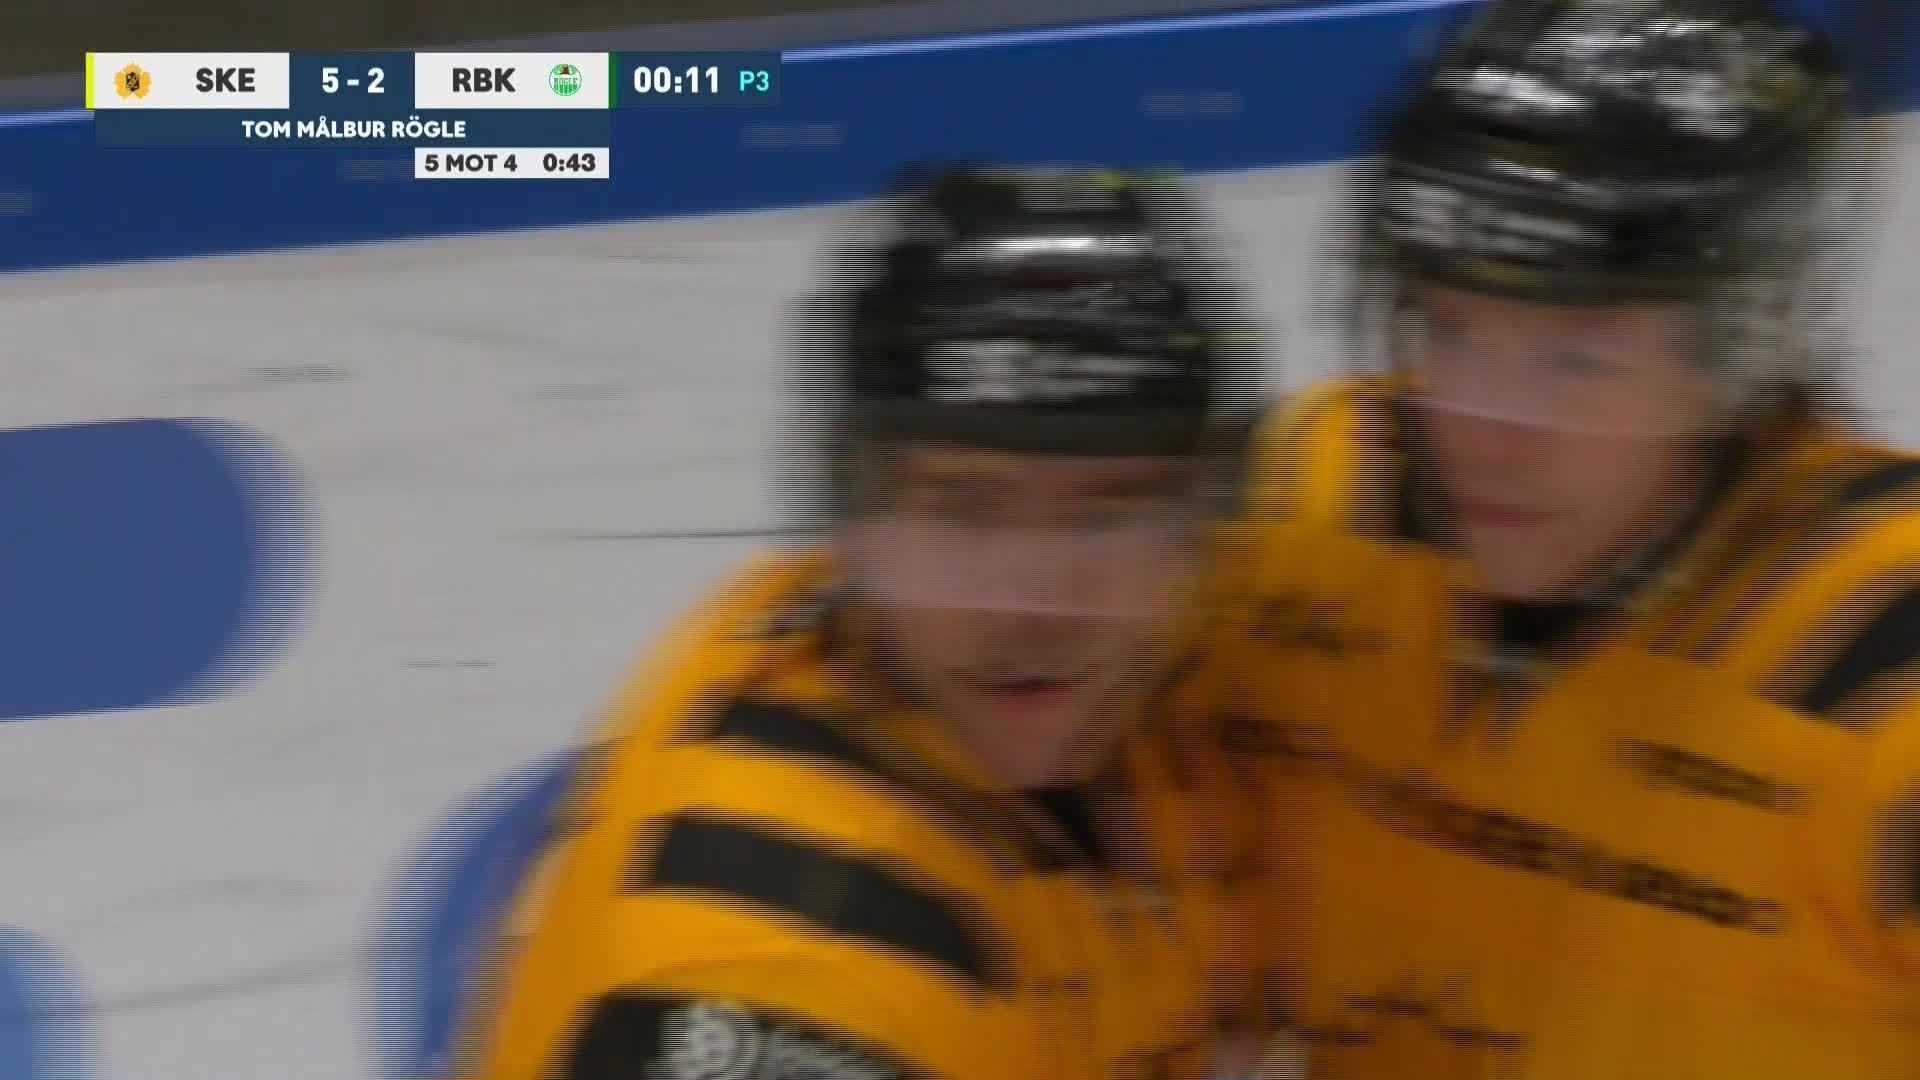 Skellefteå AIK - Rögle BK 5-2